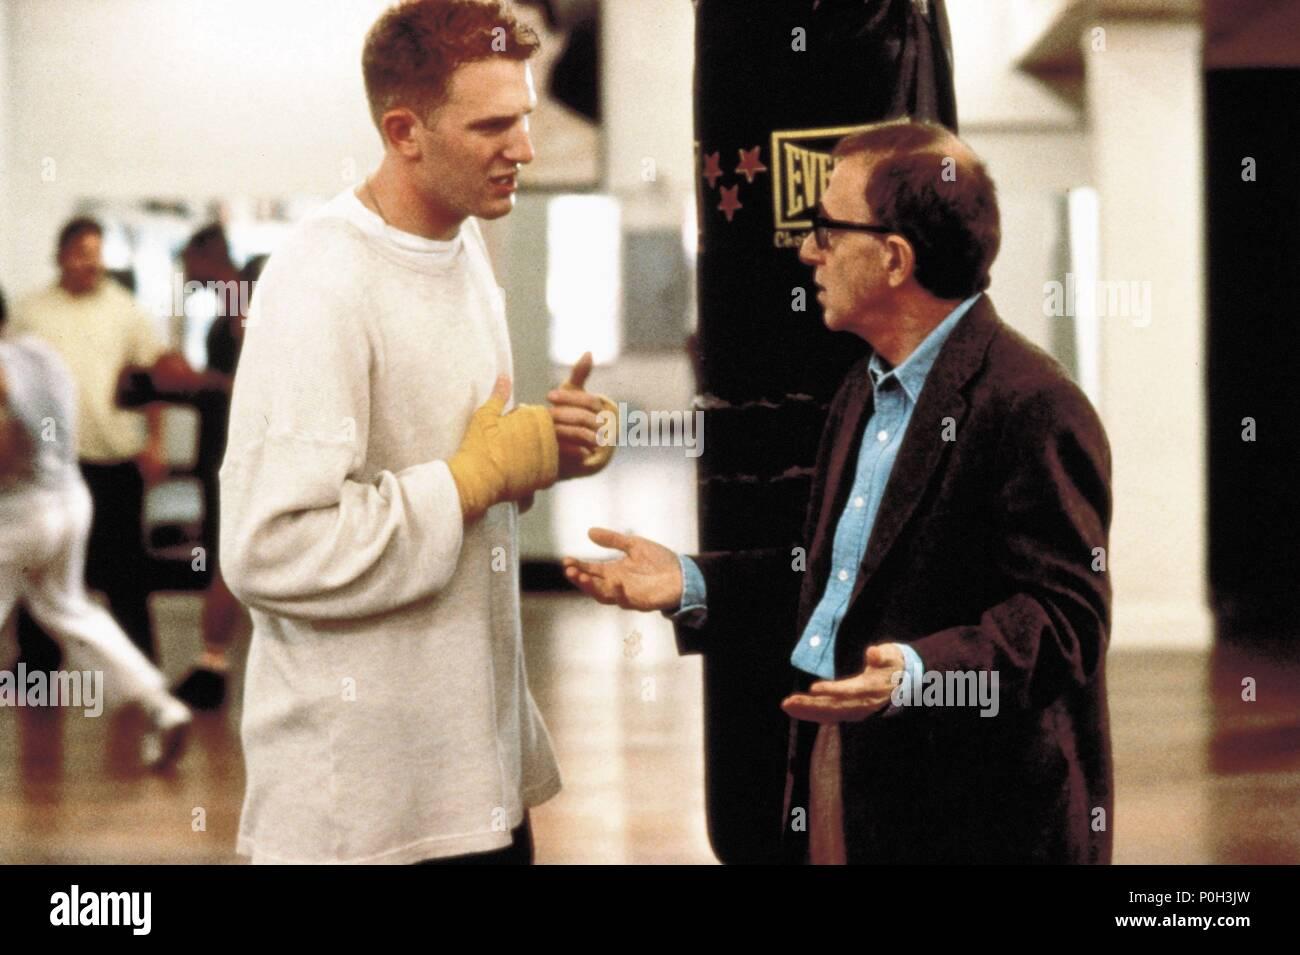 Original Film Title: MIGHTY APHRODITE.  English Title: MIGHTY APHRODITE.  Film Director: WOODY ALLEN.  Year: 1995.  Stars: WOODY ALLEN; MICHAEL RAPAPORT. Credit: MIRAMAX / Album - Stock Image